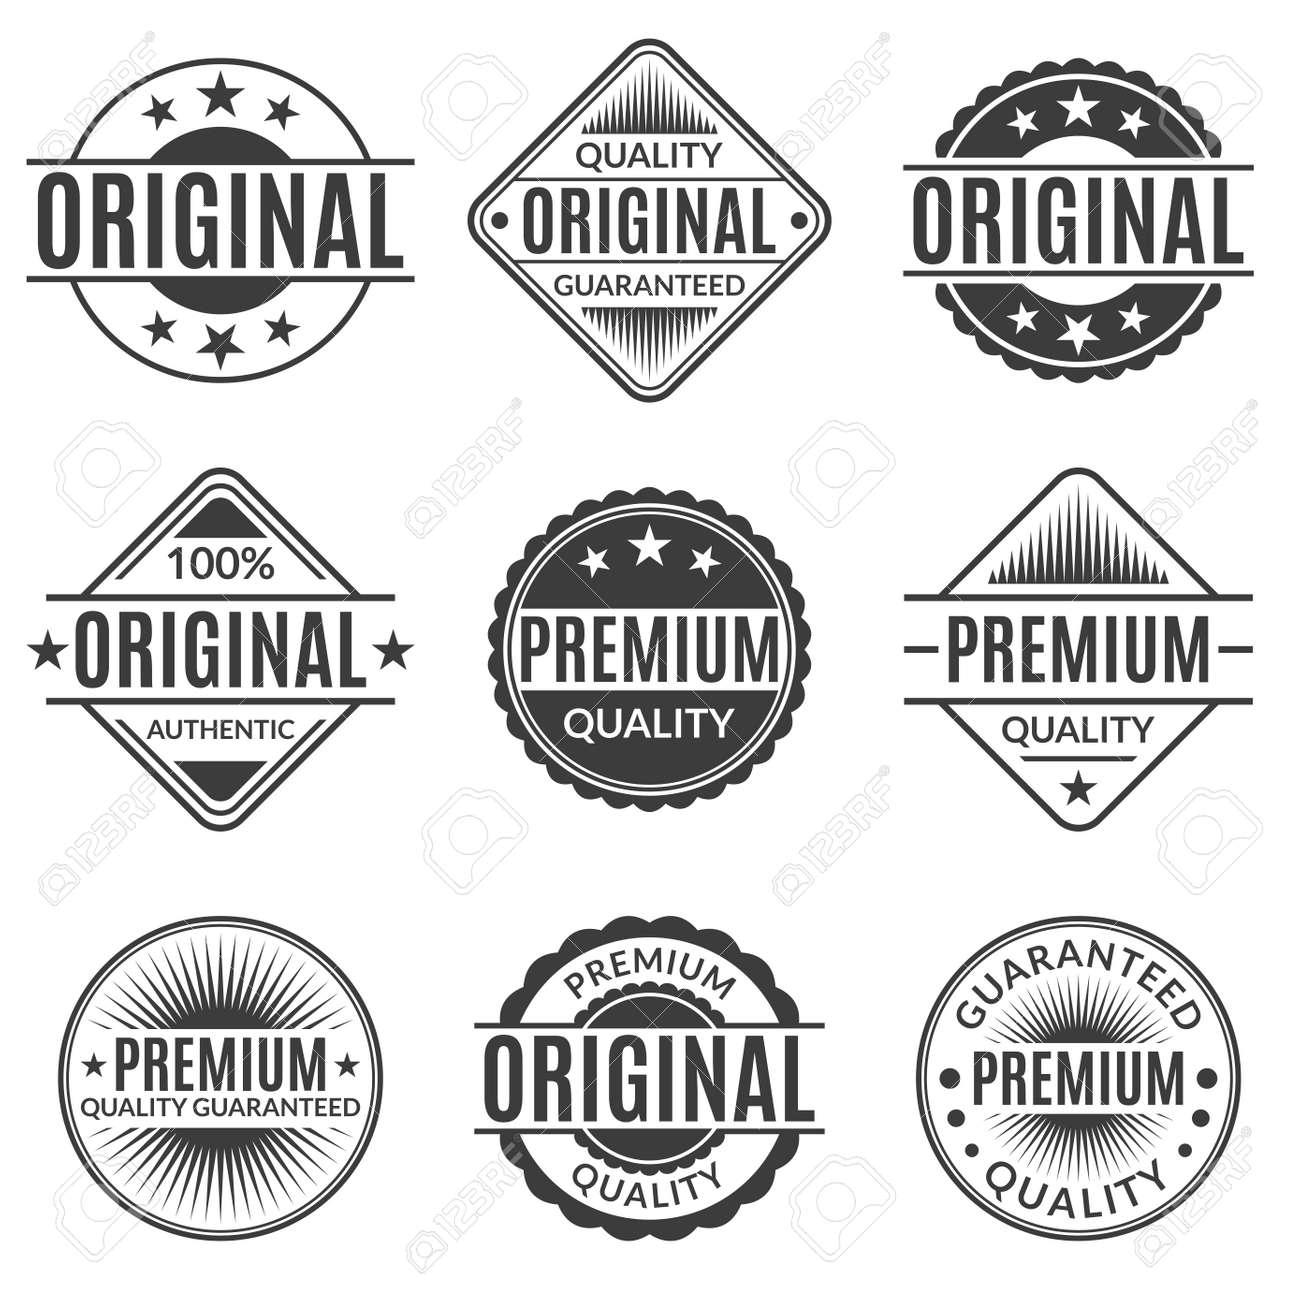 Original and Premium quality stamp or seal set. Guarantee label, emblem or badge collection. Vector illustration. - 152838935